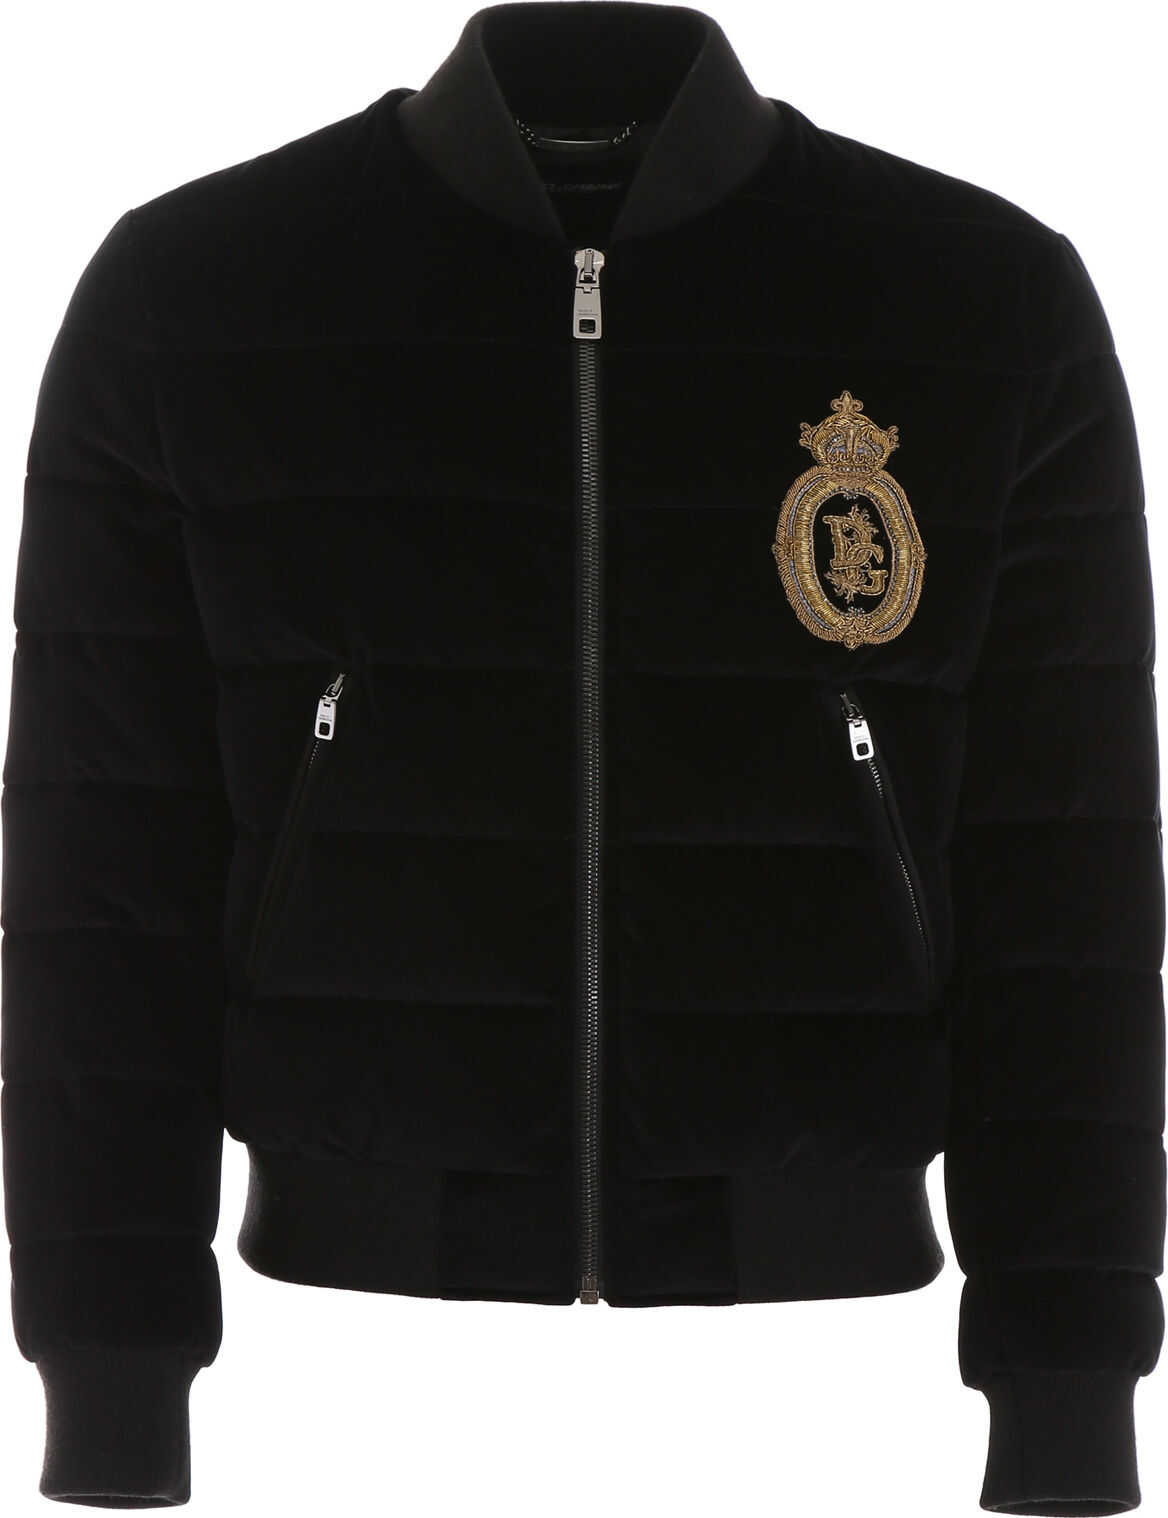 Dolce & Gabbana Velvet Bomber Jacket With Embroidery NERO